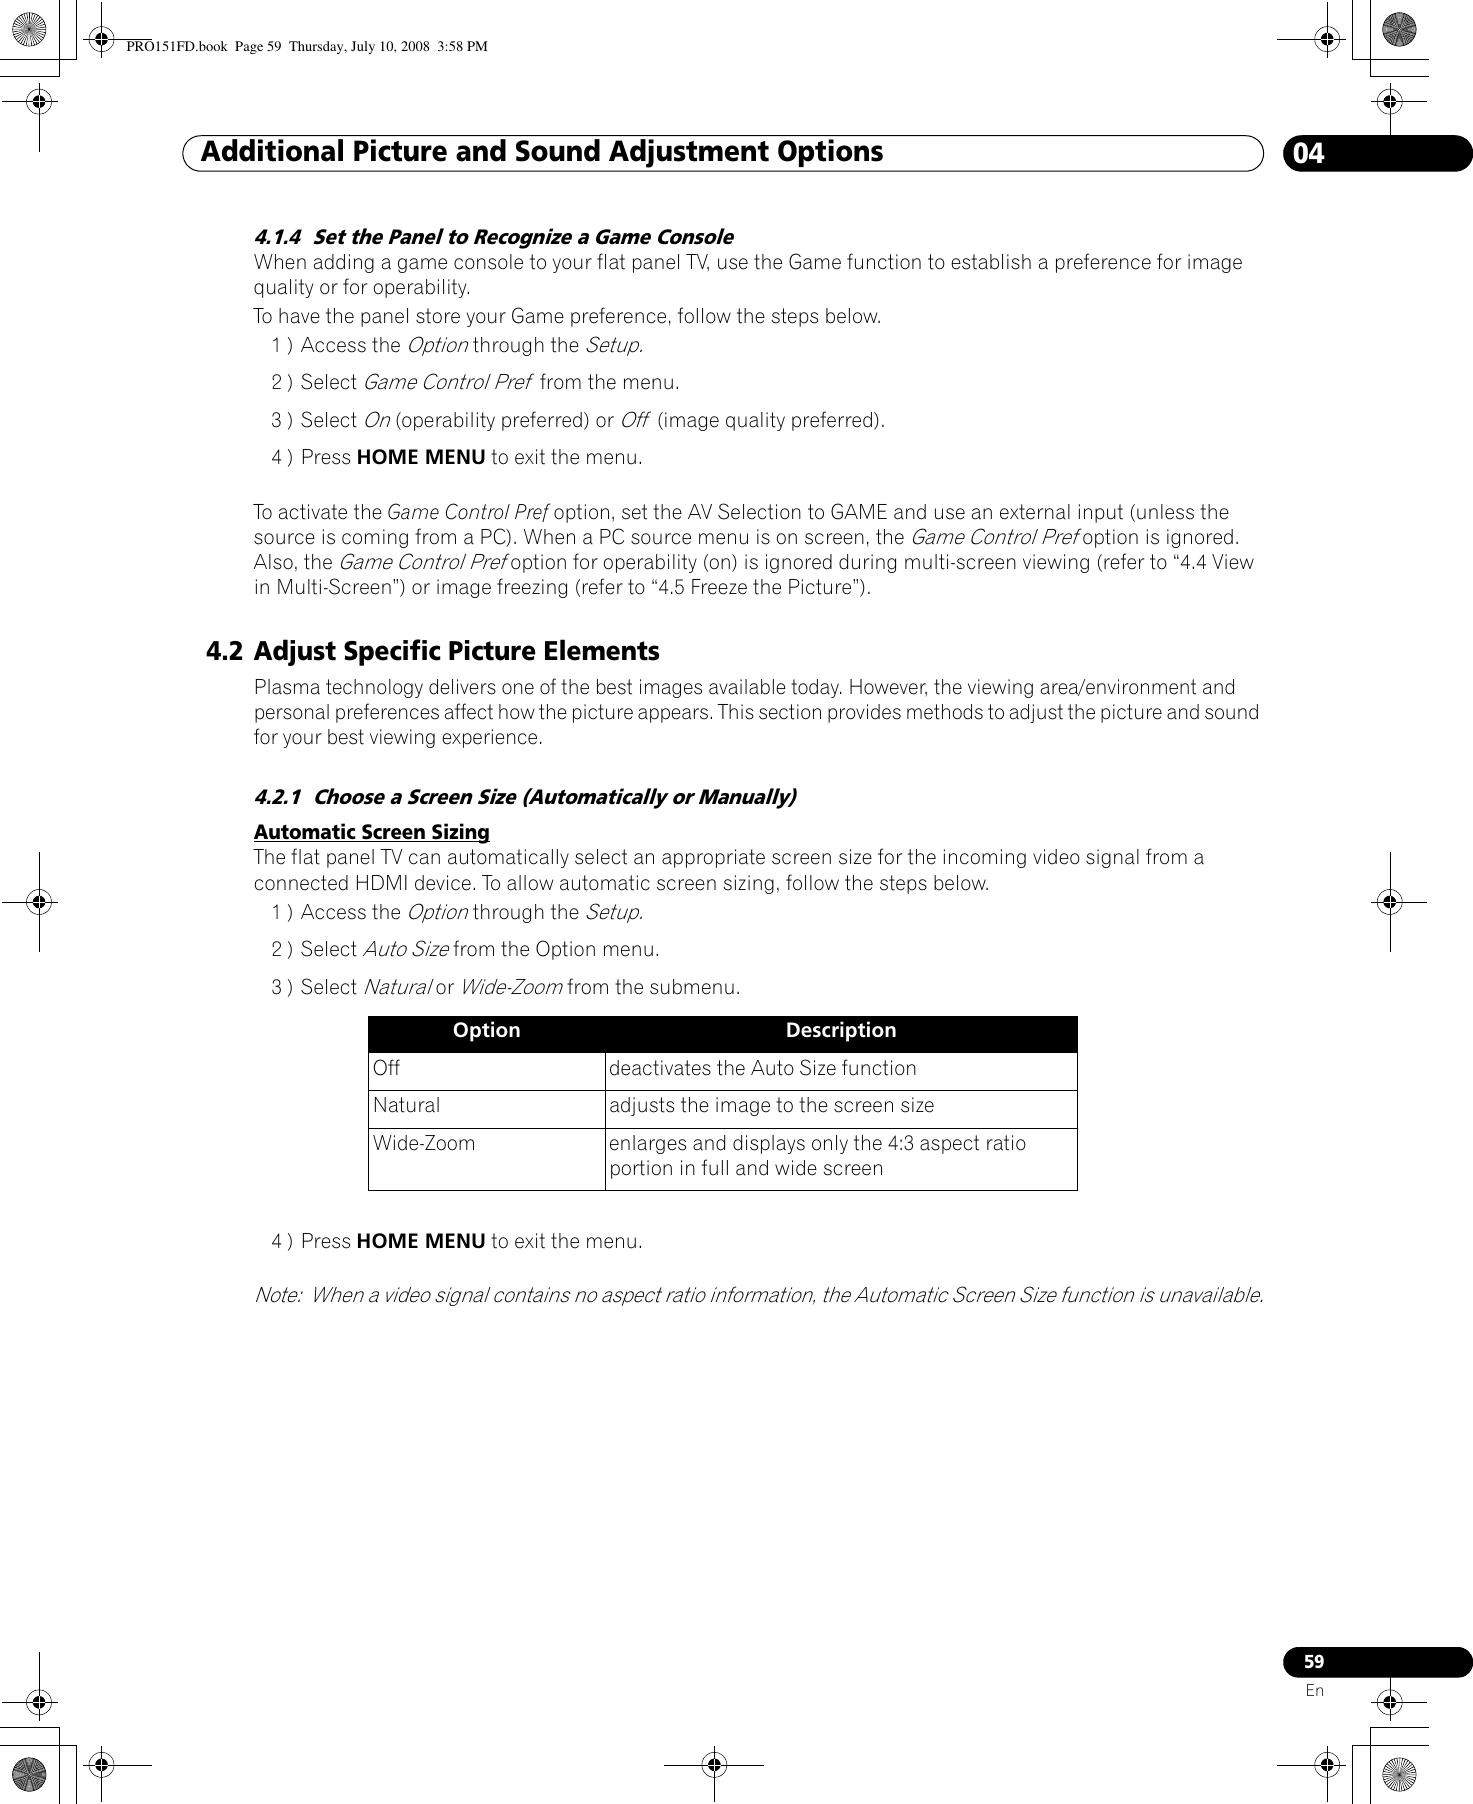 Pioneer Elite Kuro Pro 111Fd Users Manual ARB1579